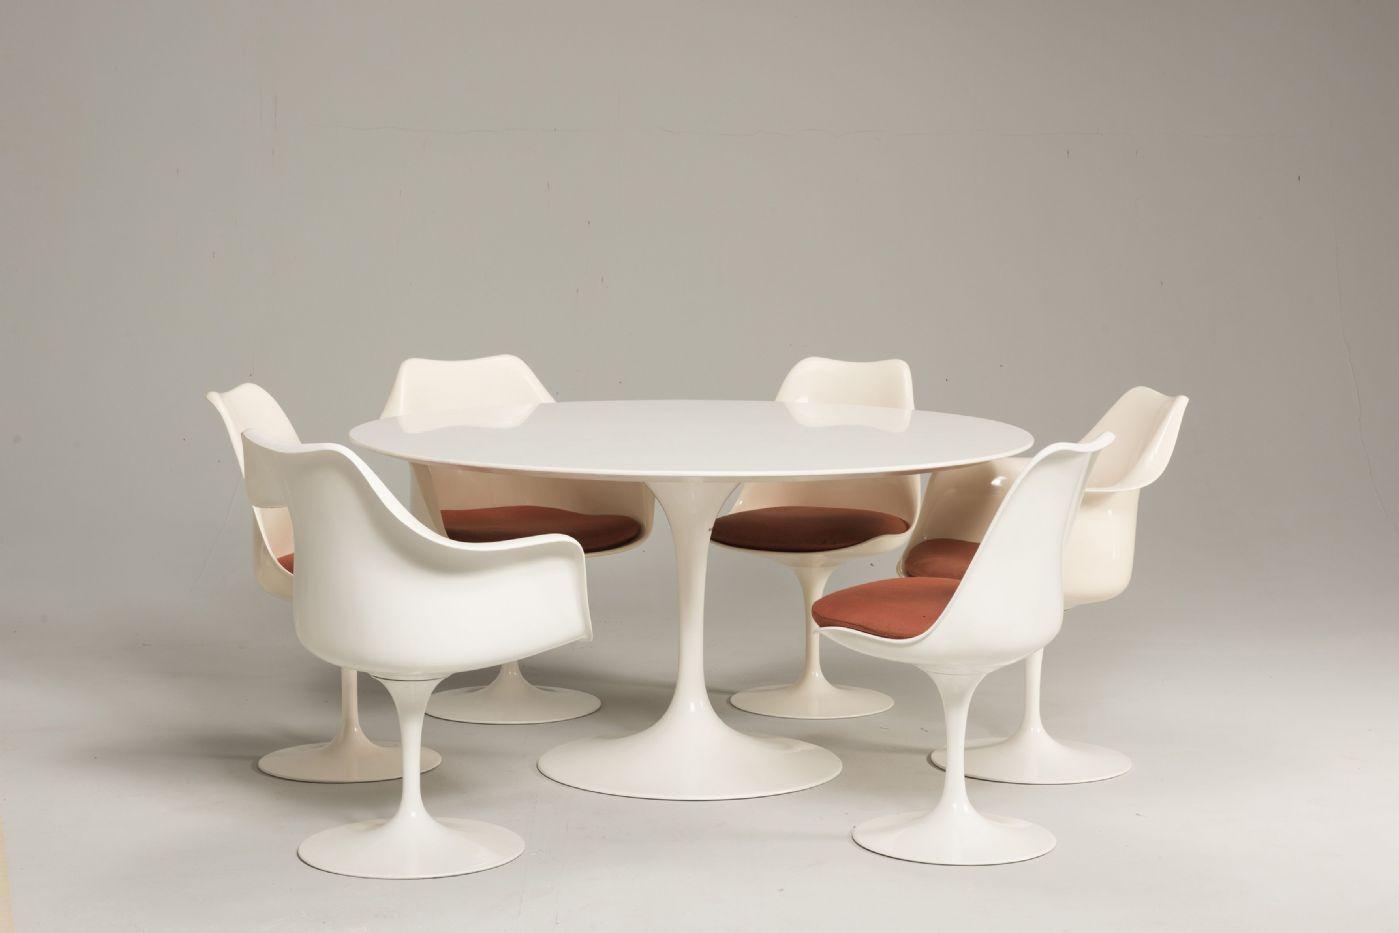 Tavolo Tulip Knoll.Set Pedestal Table Tulip And Seating By Eero Saarinen